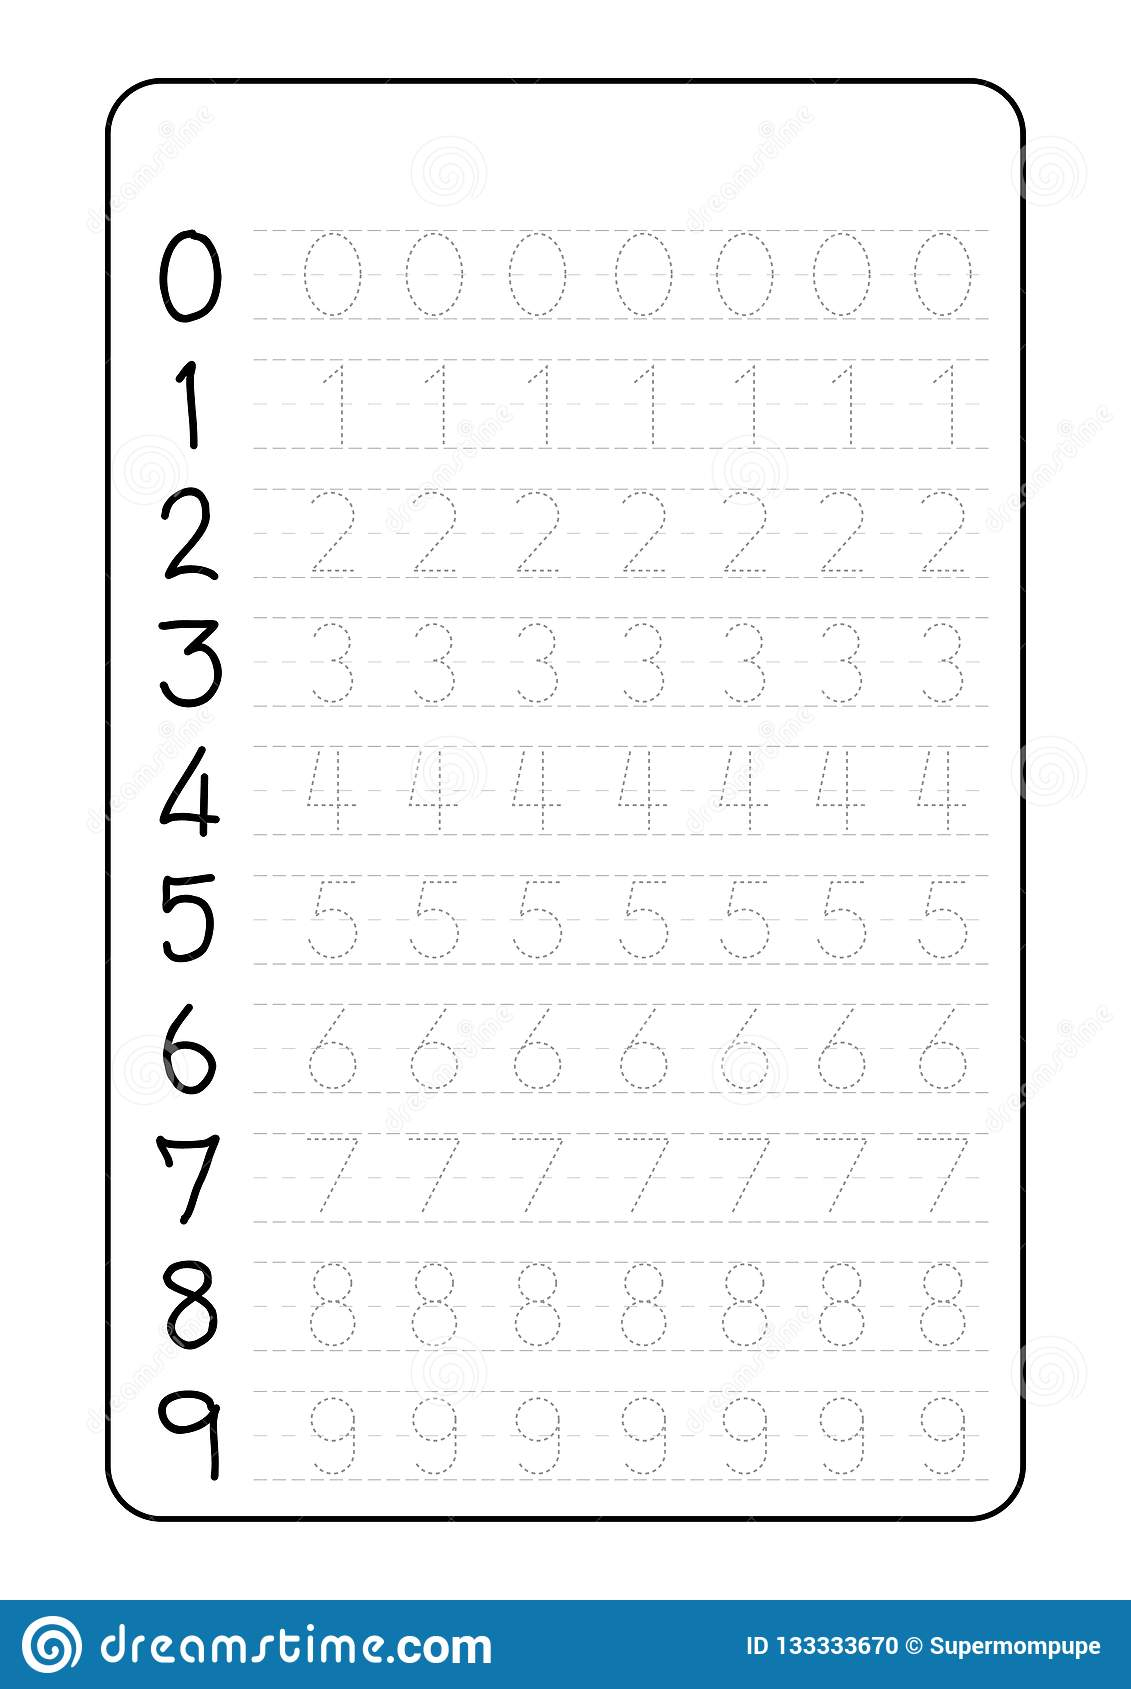 Alphabet Letters Tracing Worksheet With Alphabet Letters within Tracing Letters And Numbers For Kindergarten